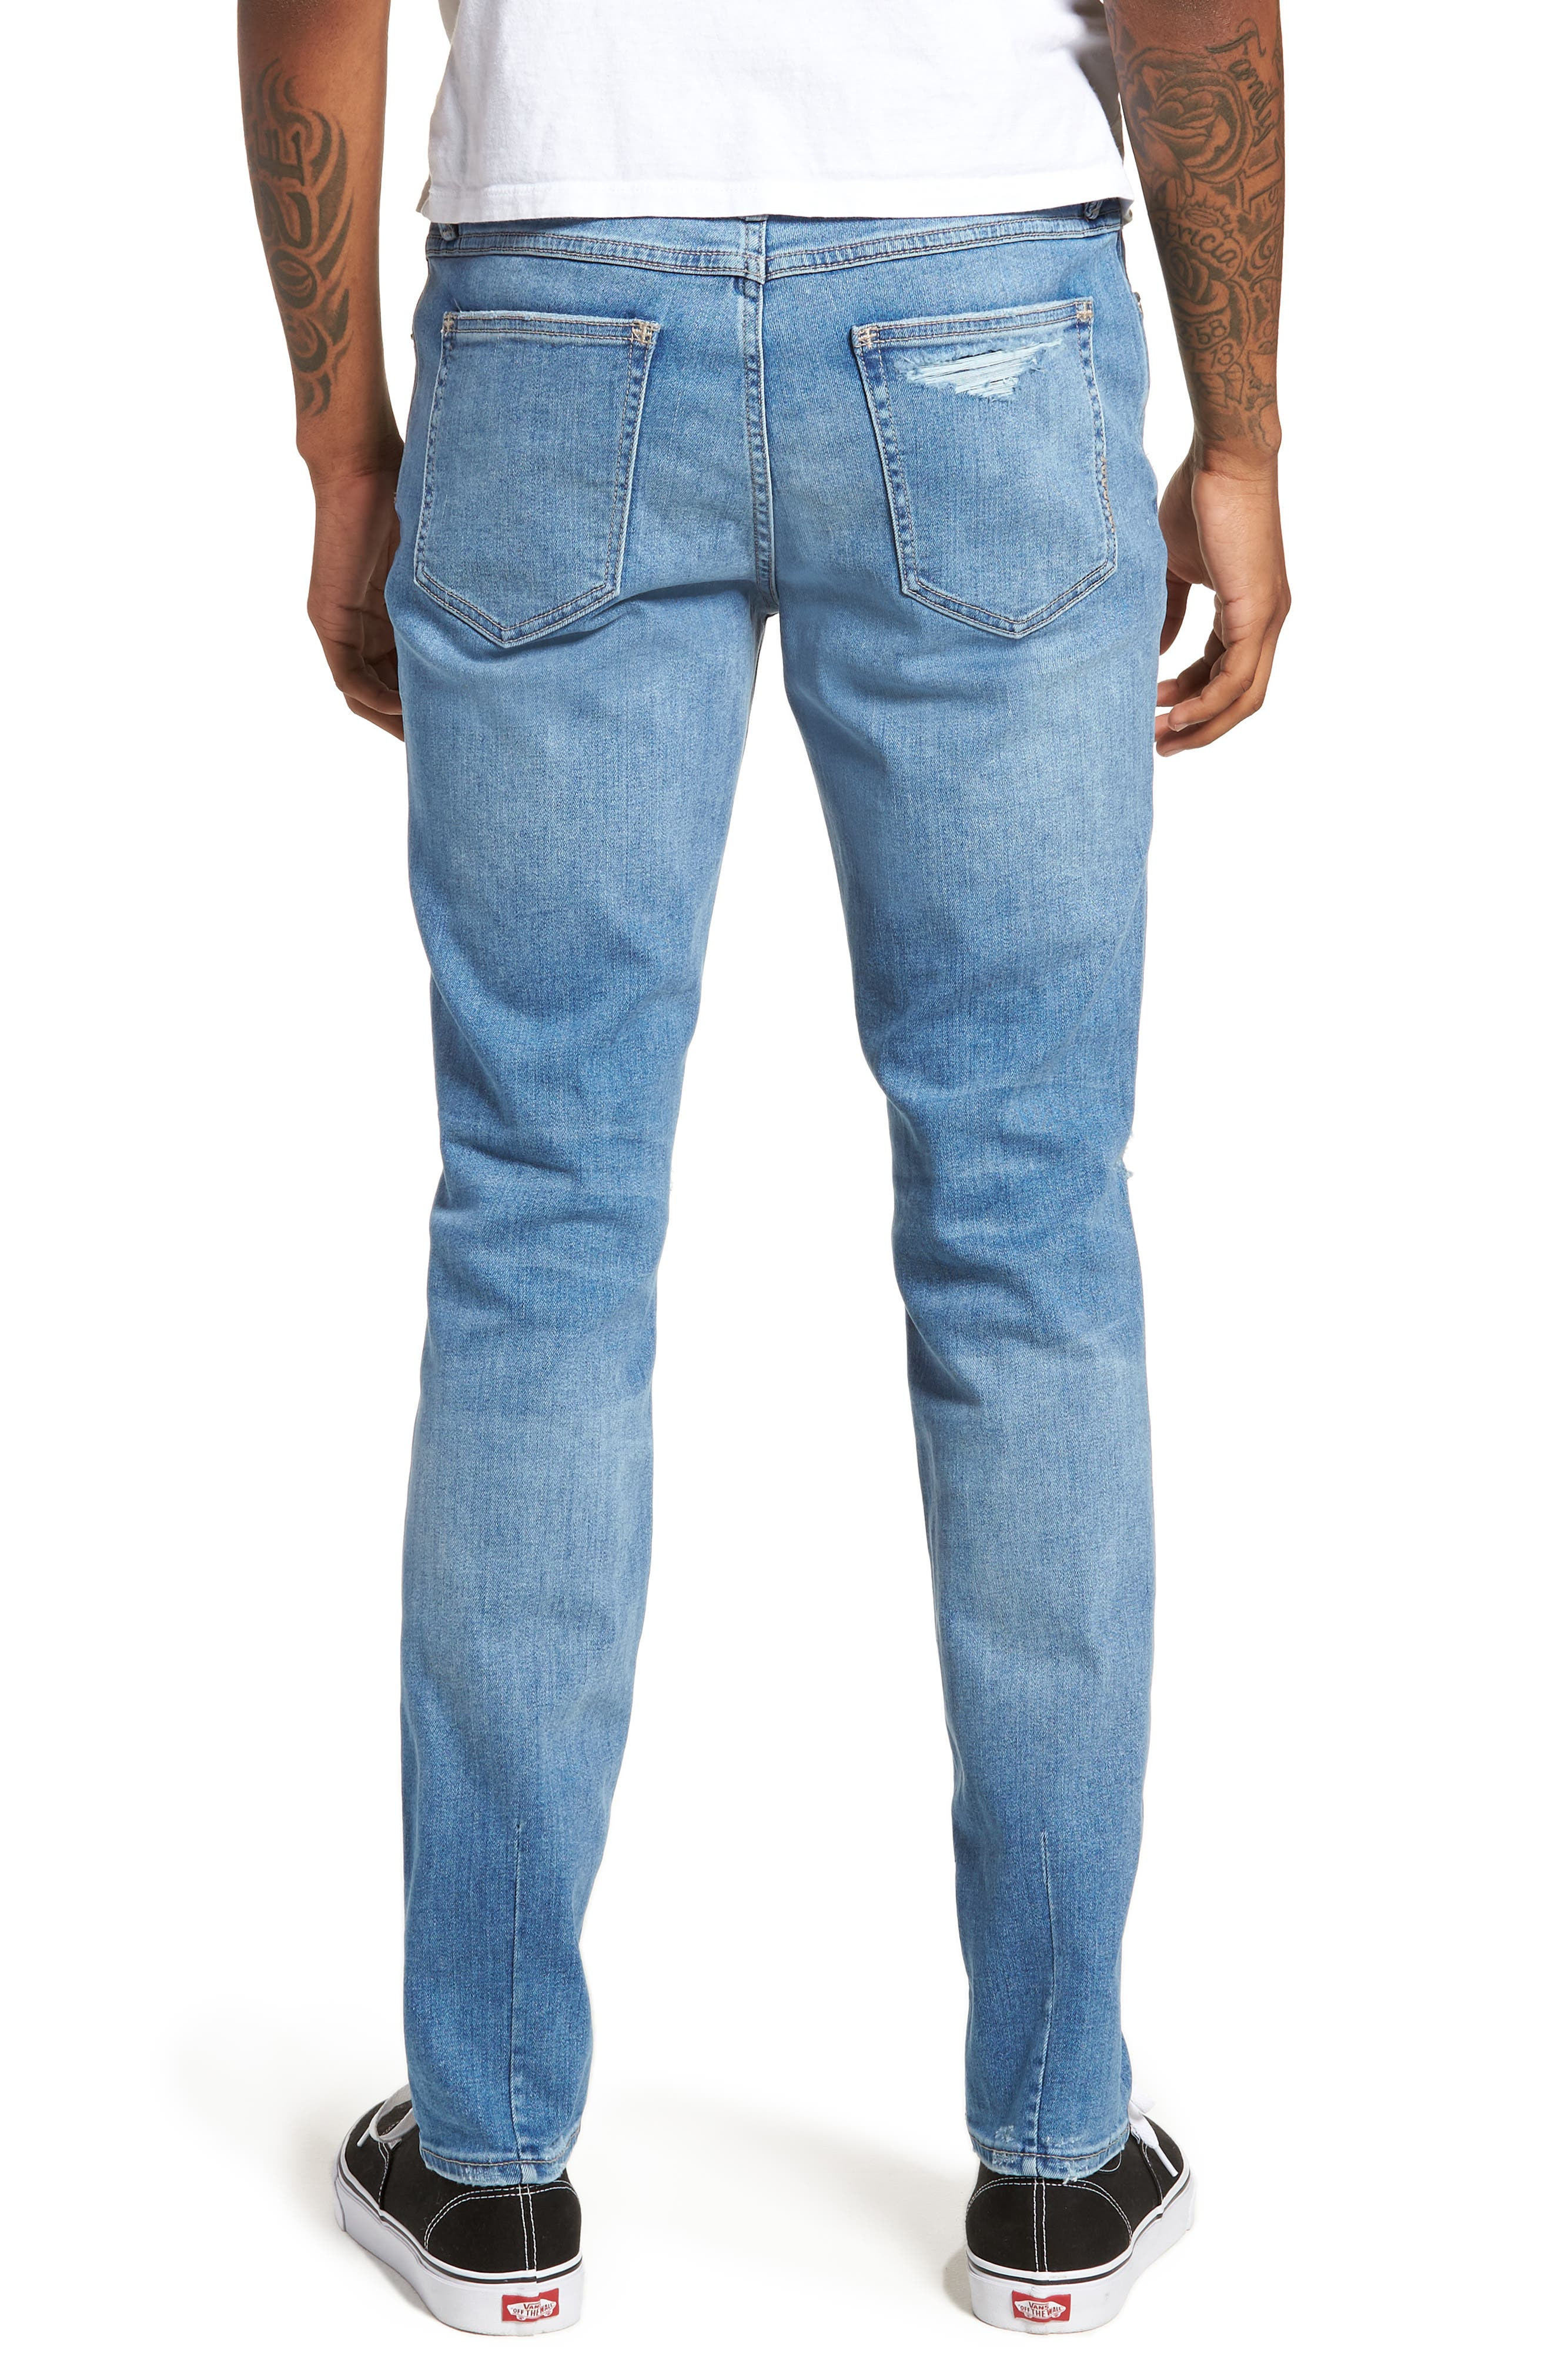 Iggy Skinny Fit Jeans,                             Alternate thumbnail 2, color,                             Broken Lights